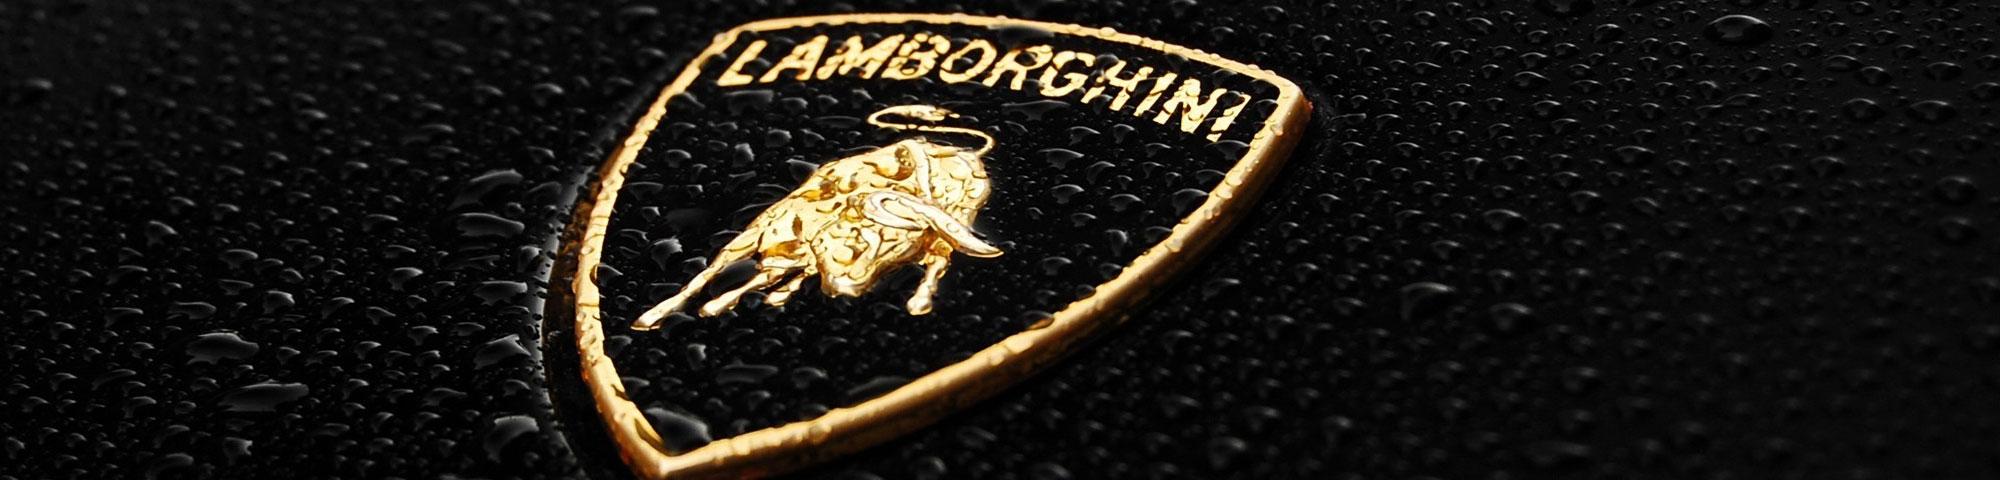 CLMS - Manufacturer - Lamborghini